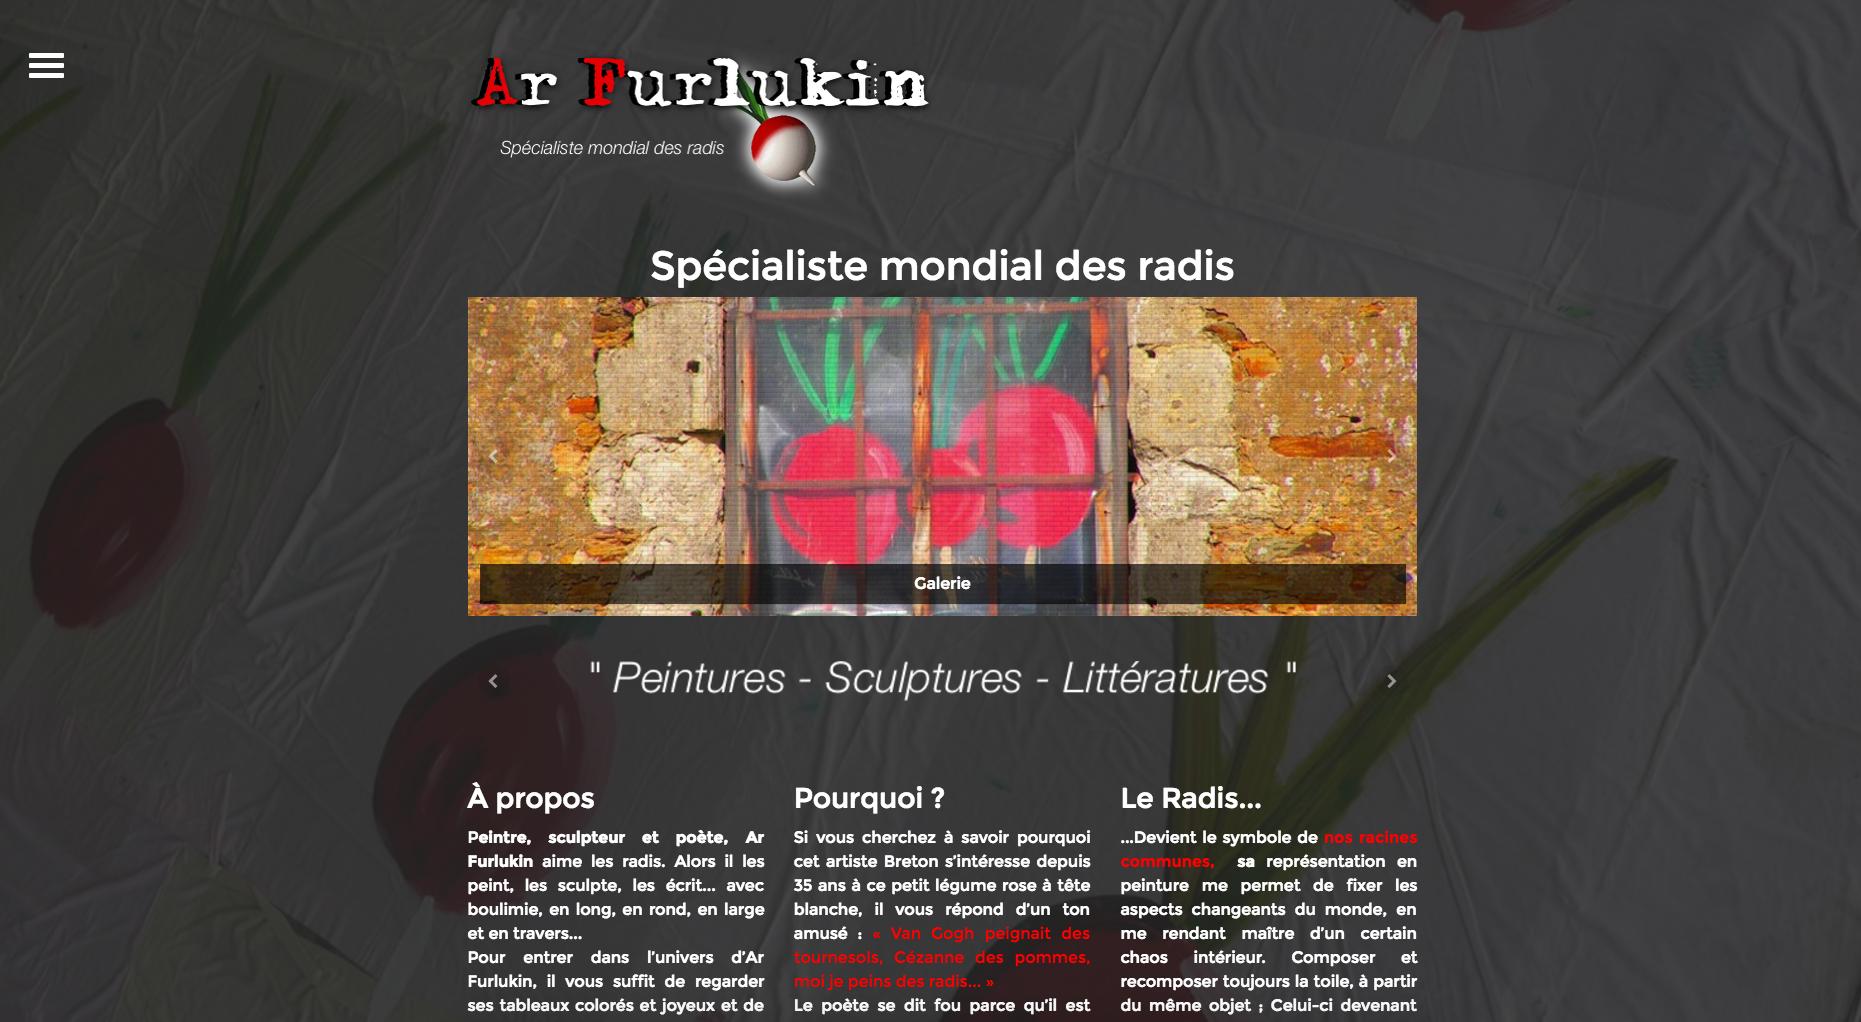 http://www.ar-furlukin.com